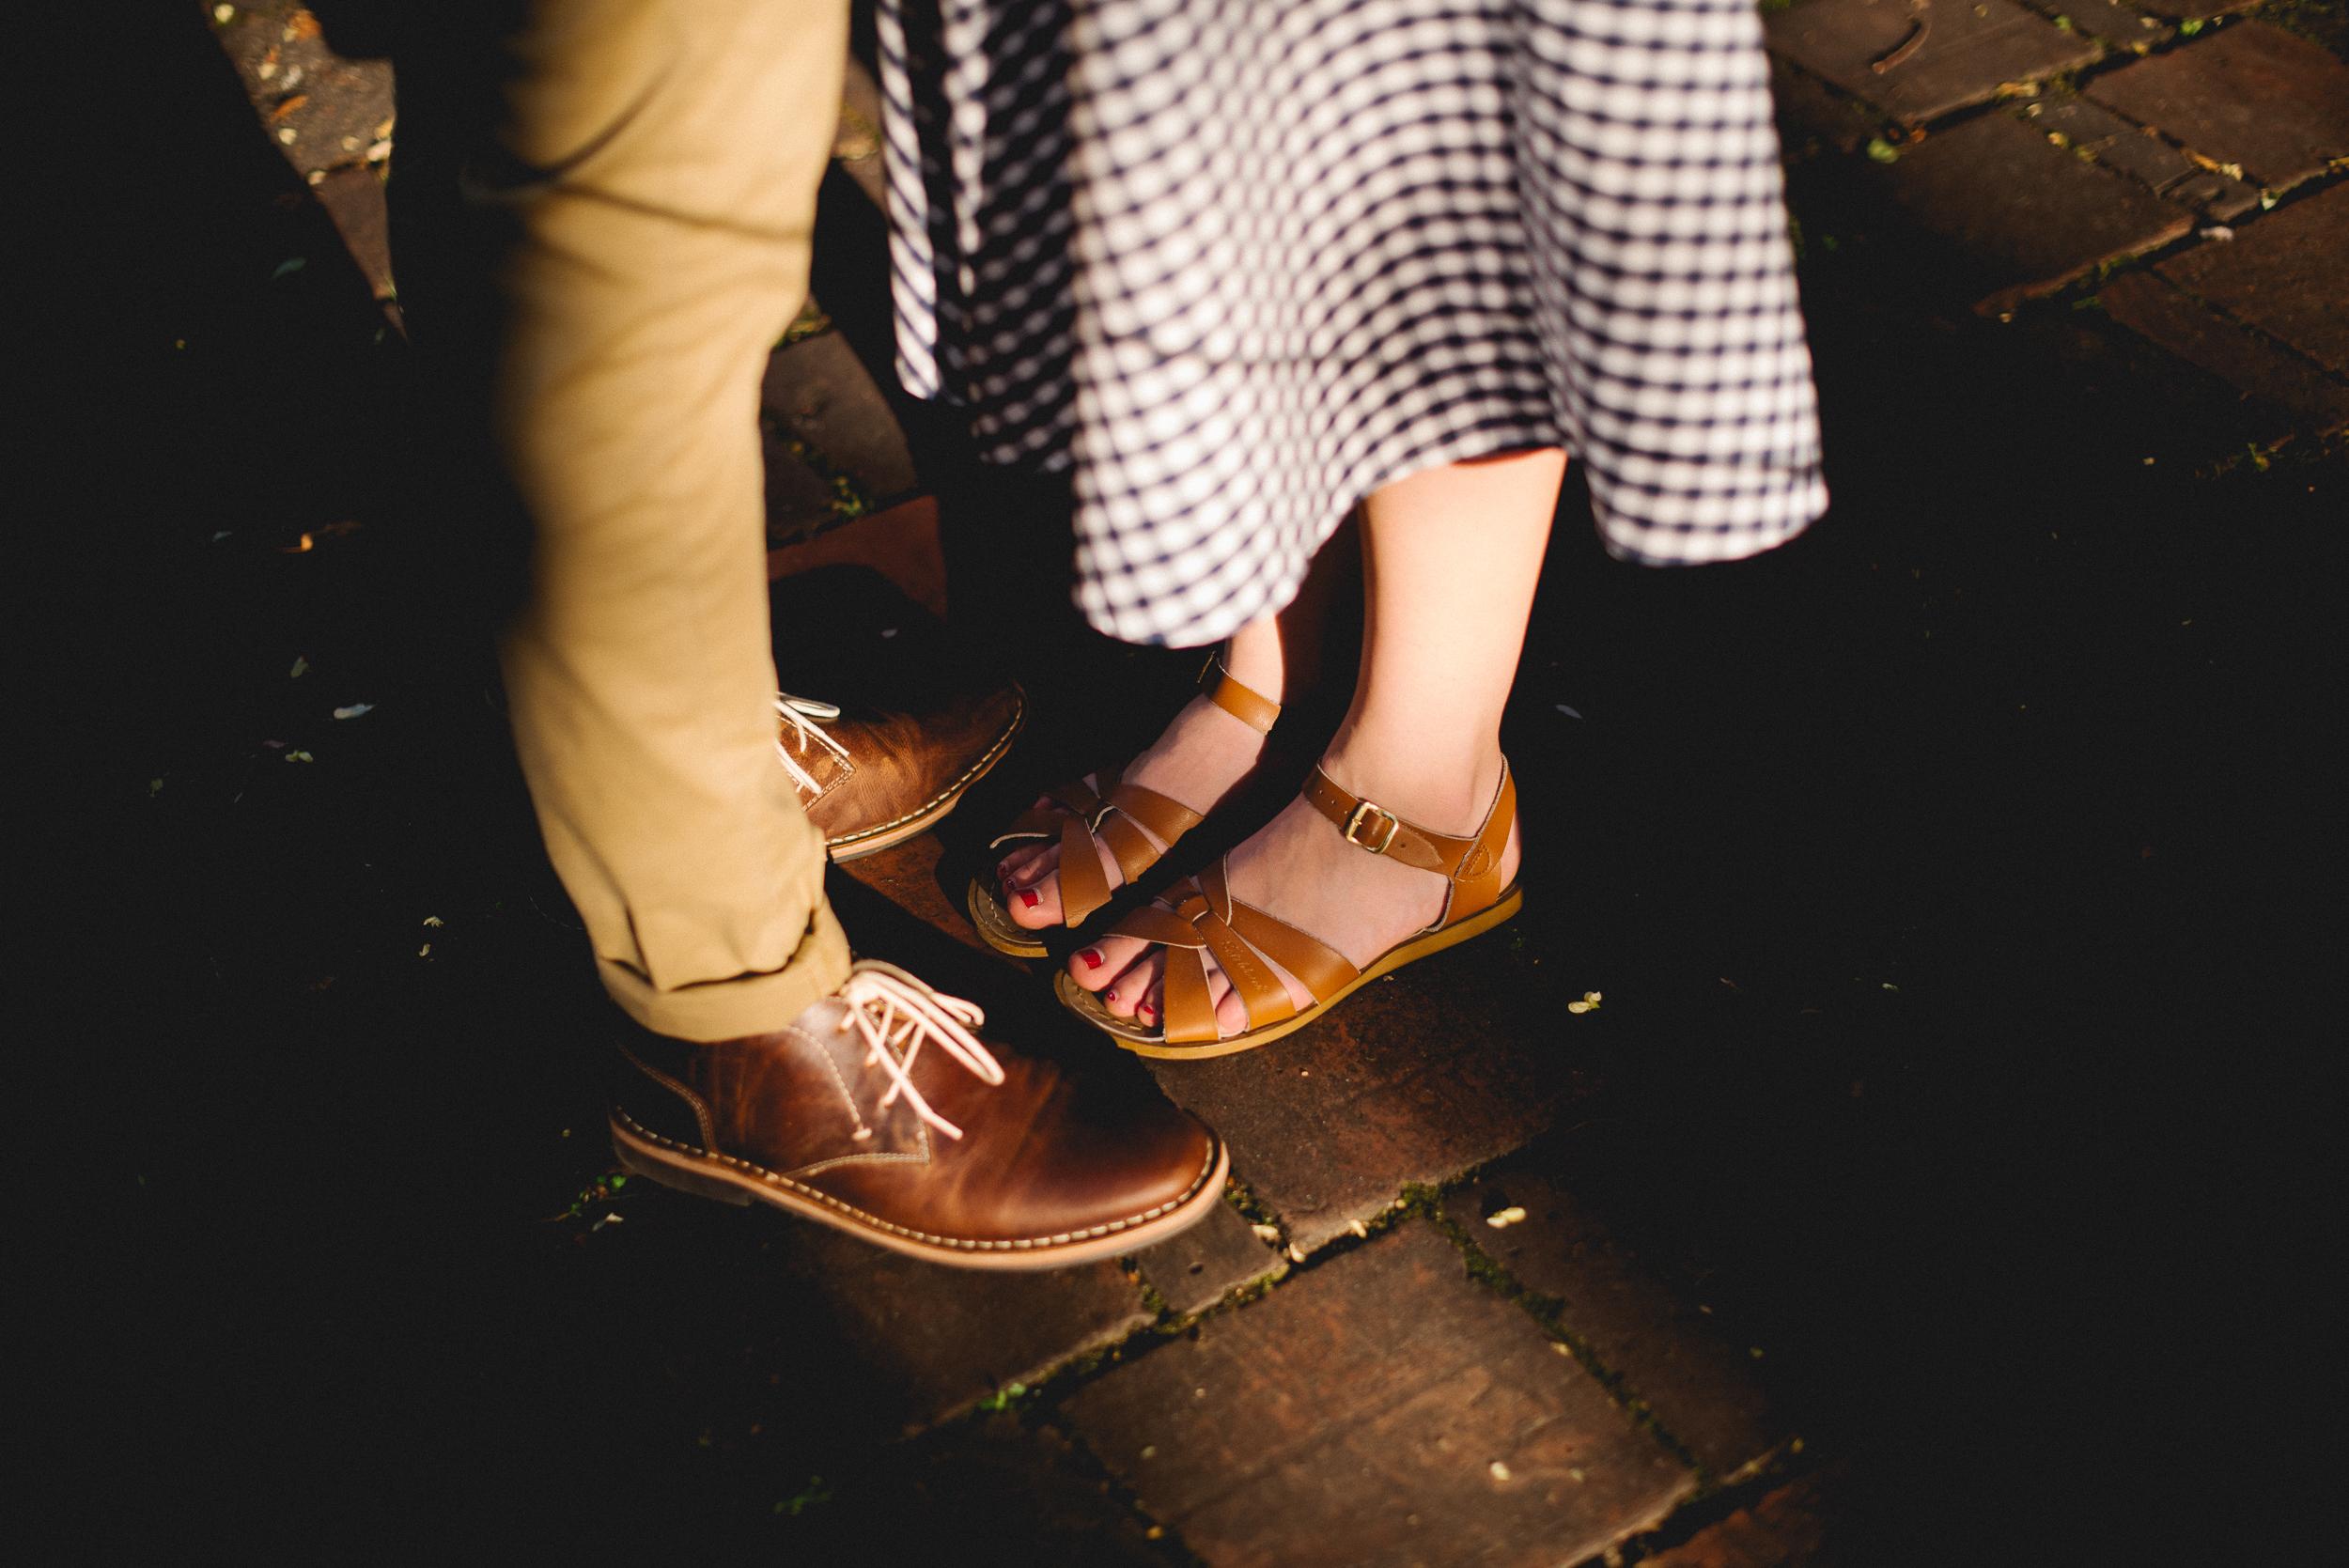 Peaberry-Photography-Society-Hill-Philadelphia-Pennsylvania-Newlyweds-Just-Married-027.jpg